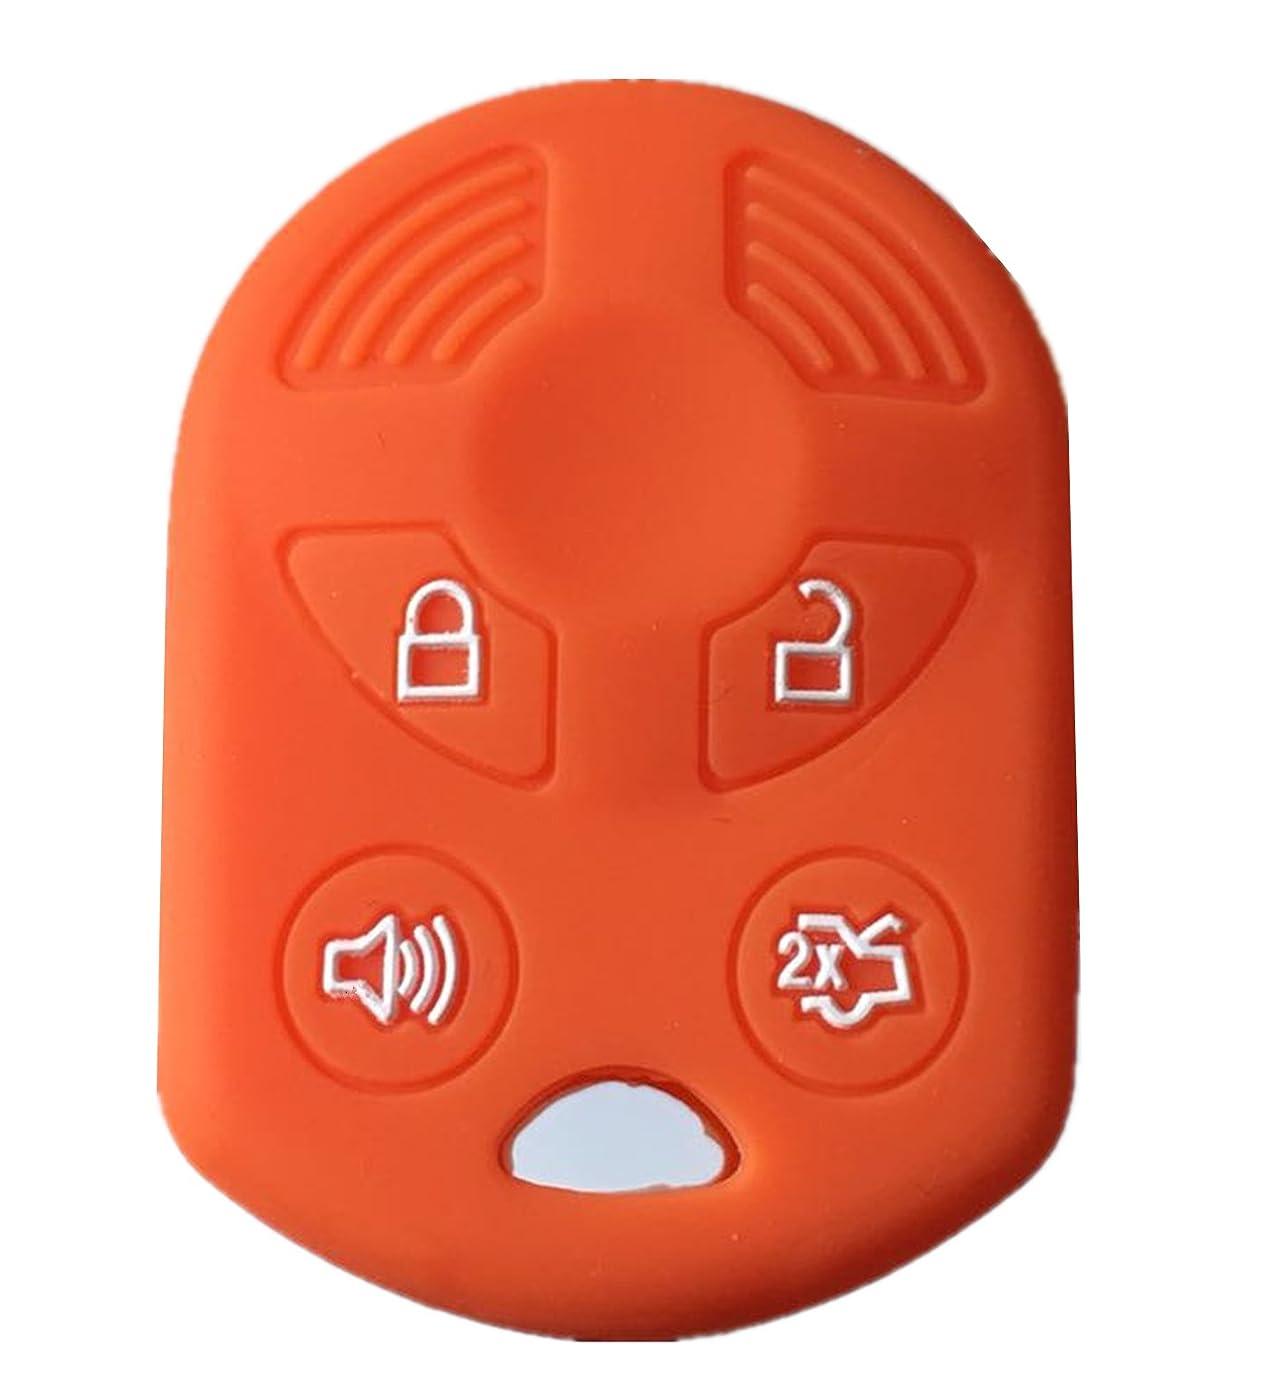 Rpkey Silicone Keyless Entry Remote Control Key Fob Cover Case protector For Ford Lincoln Mercury OUCD6000022 164-R8046 164-R7040 CWTWB1U722 (Orange)